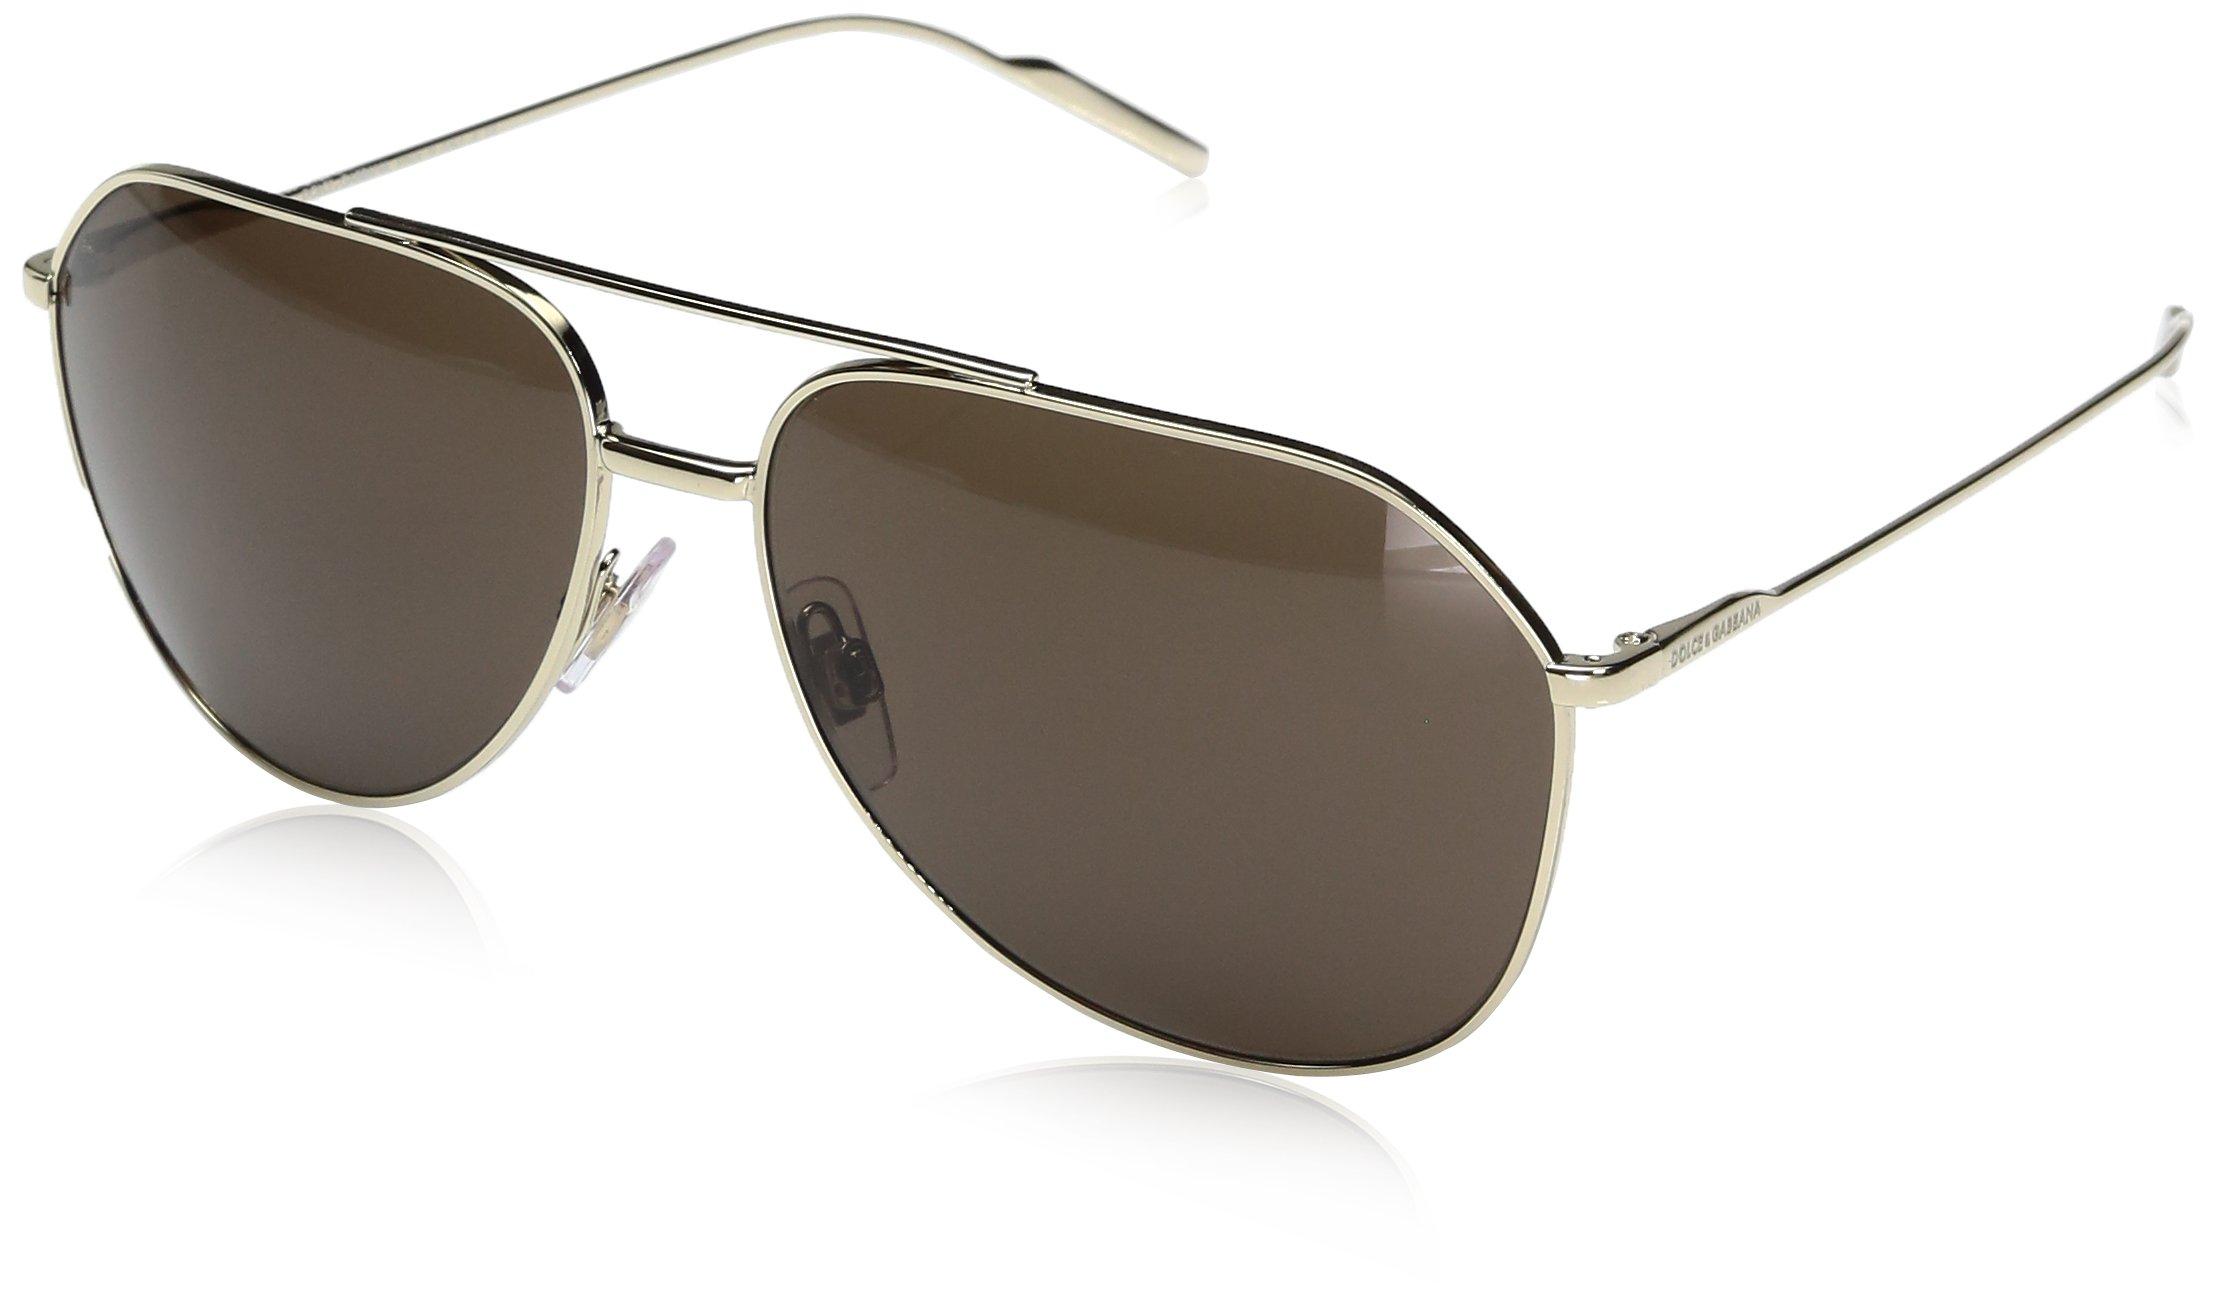 021fe01949a9 Dolce Gabbana Sunglasses Aviator Top Deals   Lowest Price ...